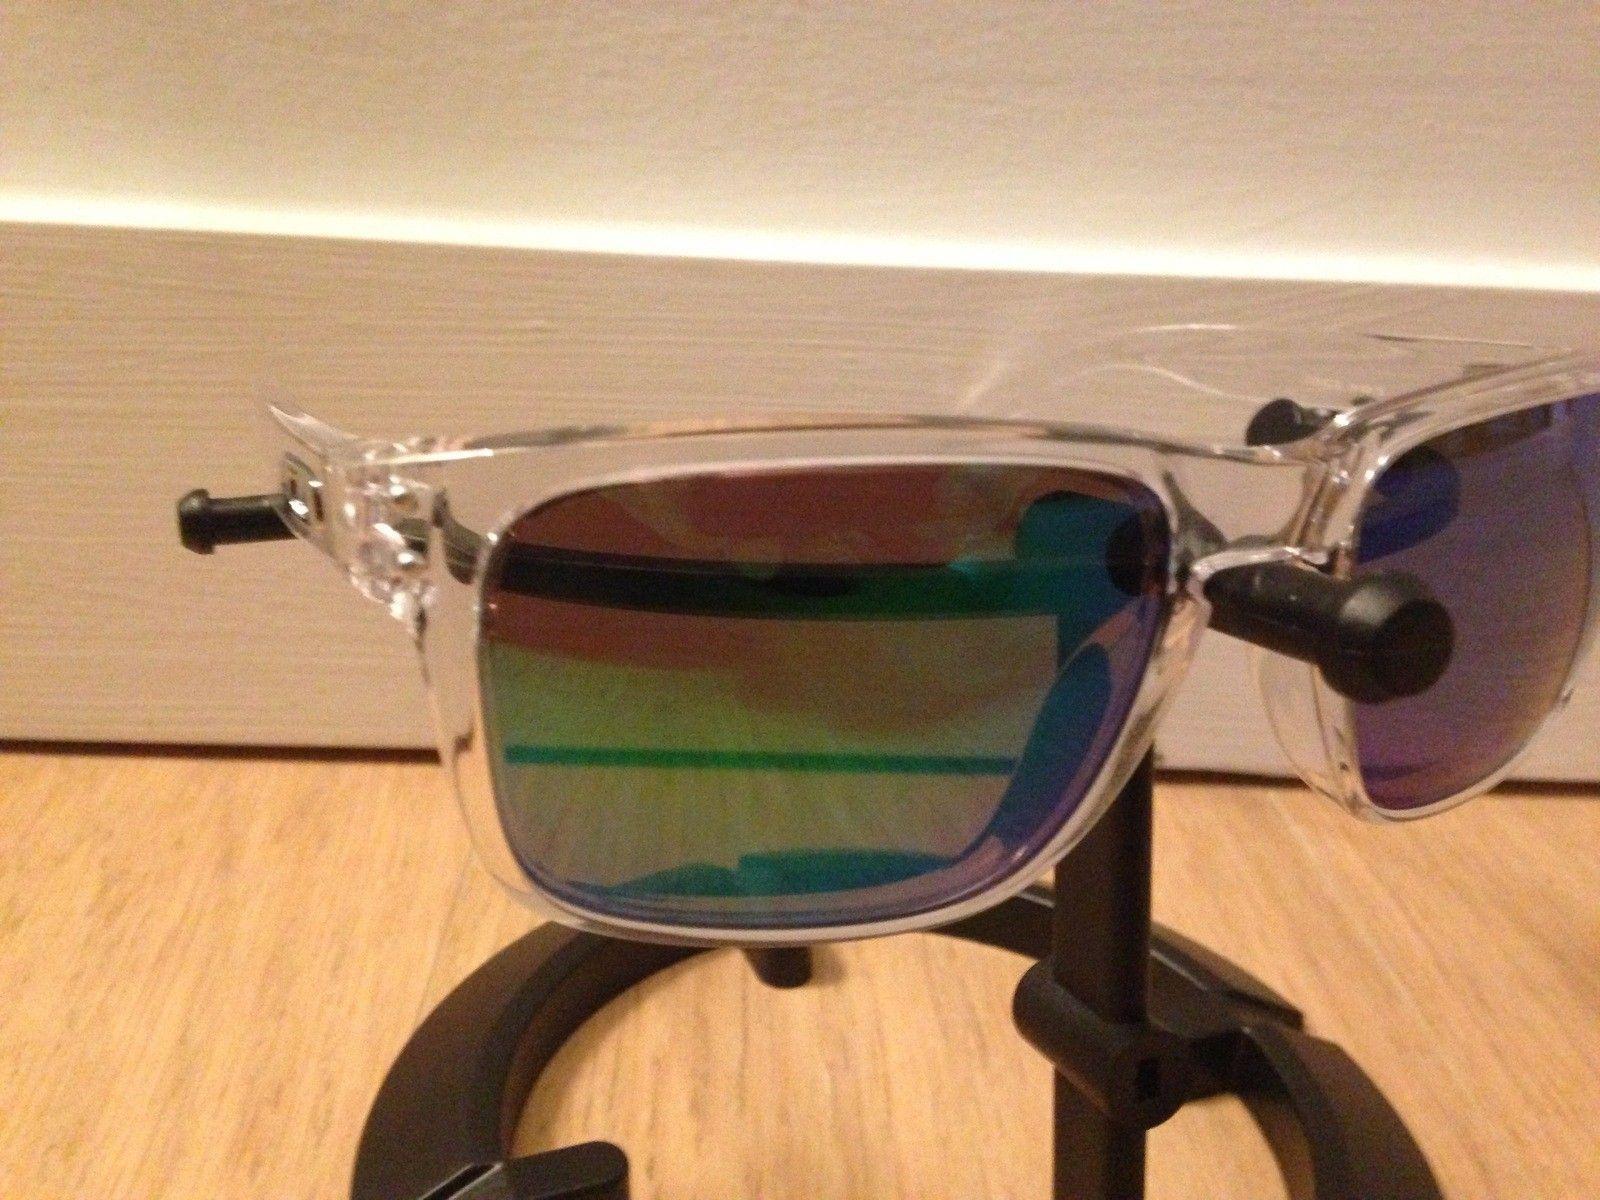 Revant Optics HC3 Elite Mirrorshield Lens Review - IMG_1735.JPG